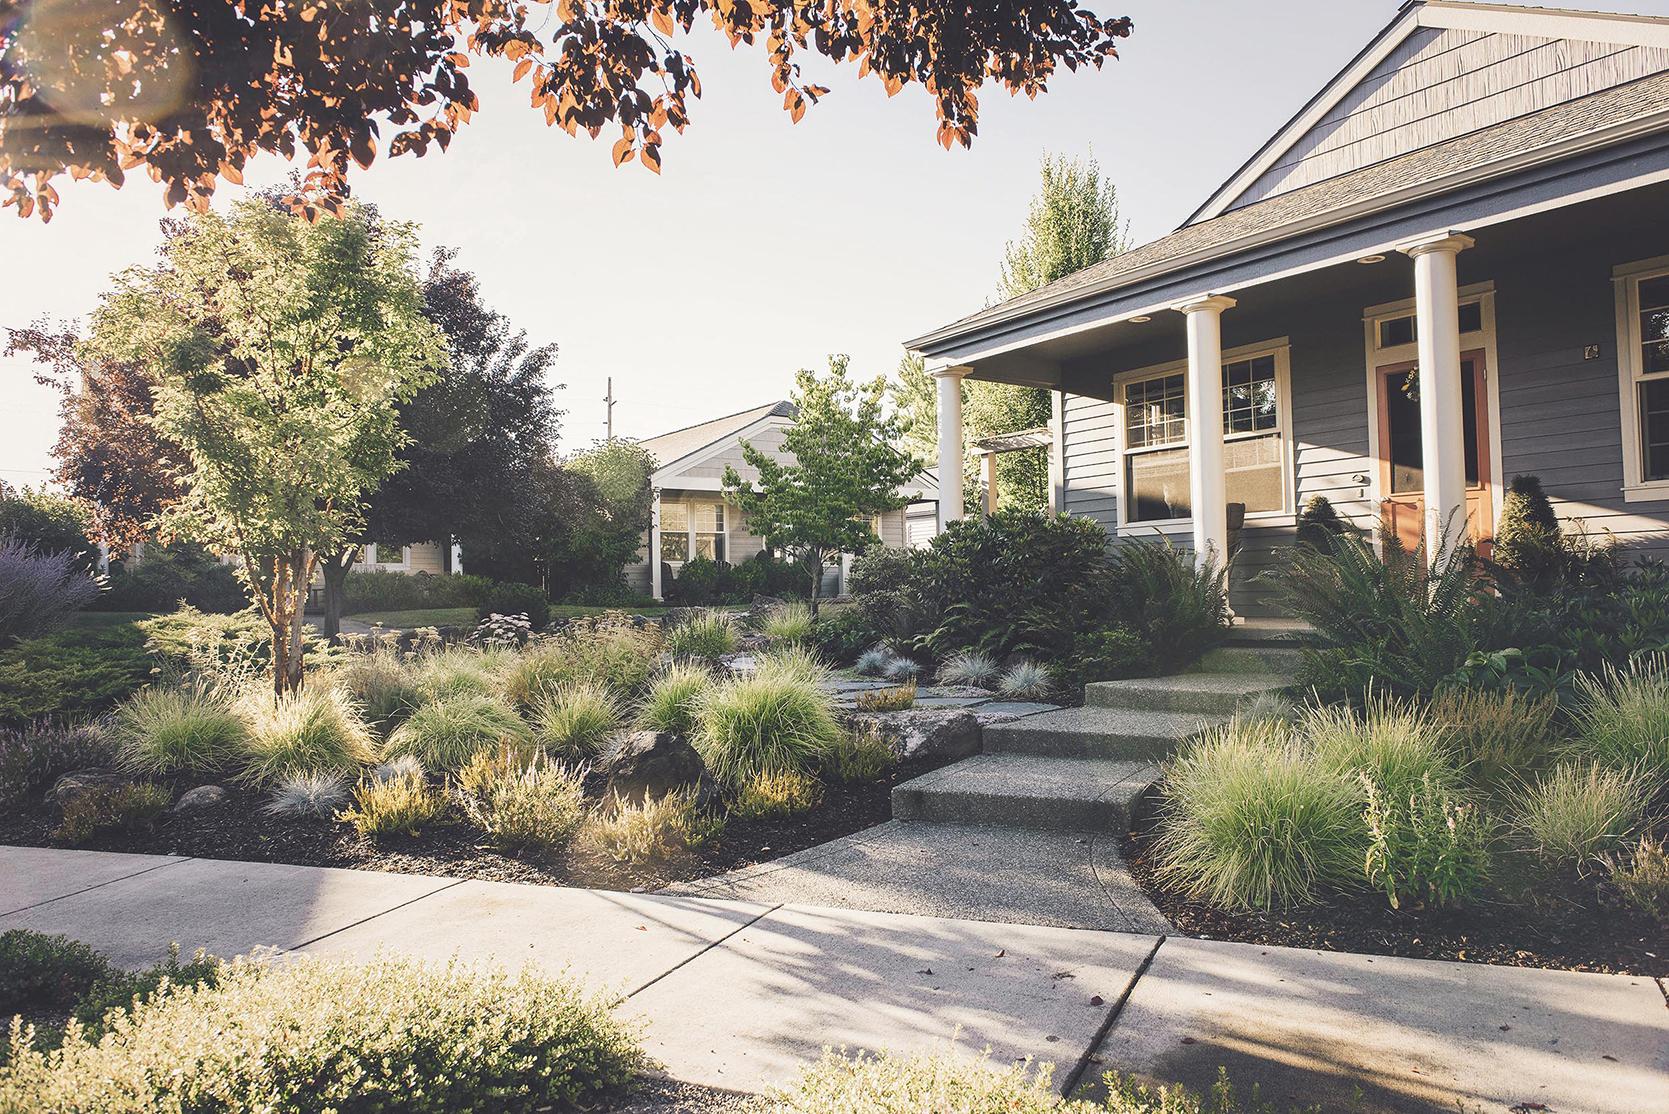 flagstone walkway + perennial + shrub low maintenance drought tolerant garden + smart irrigation